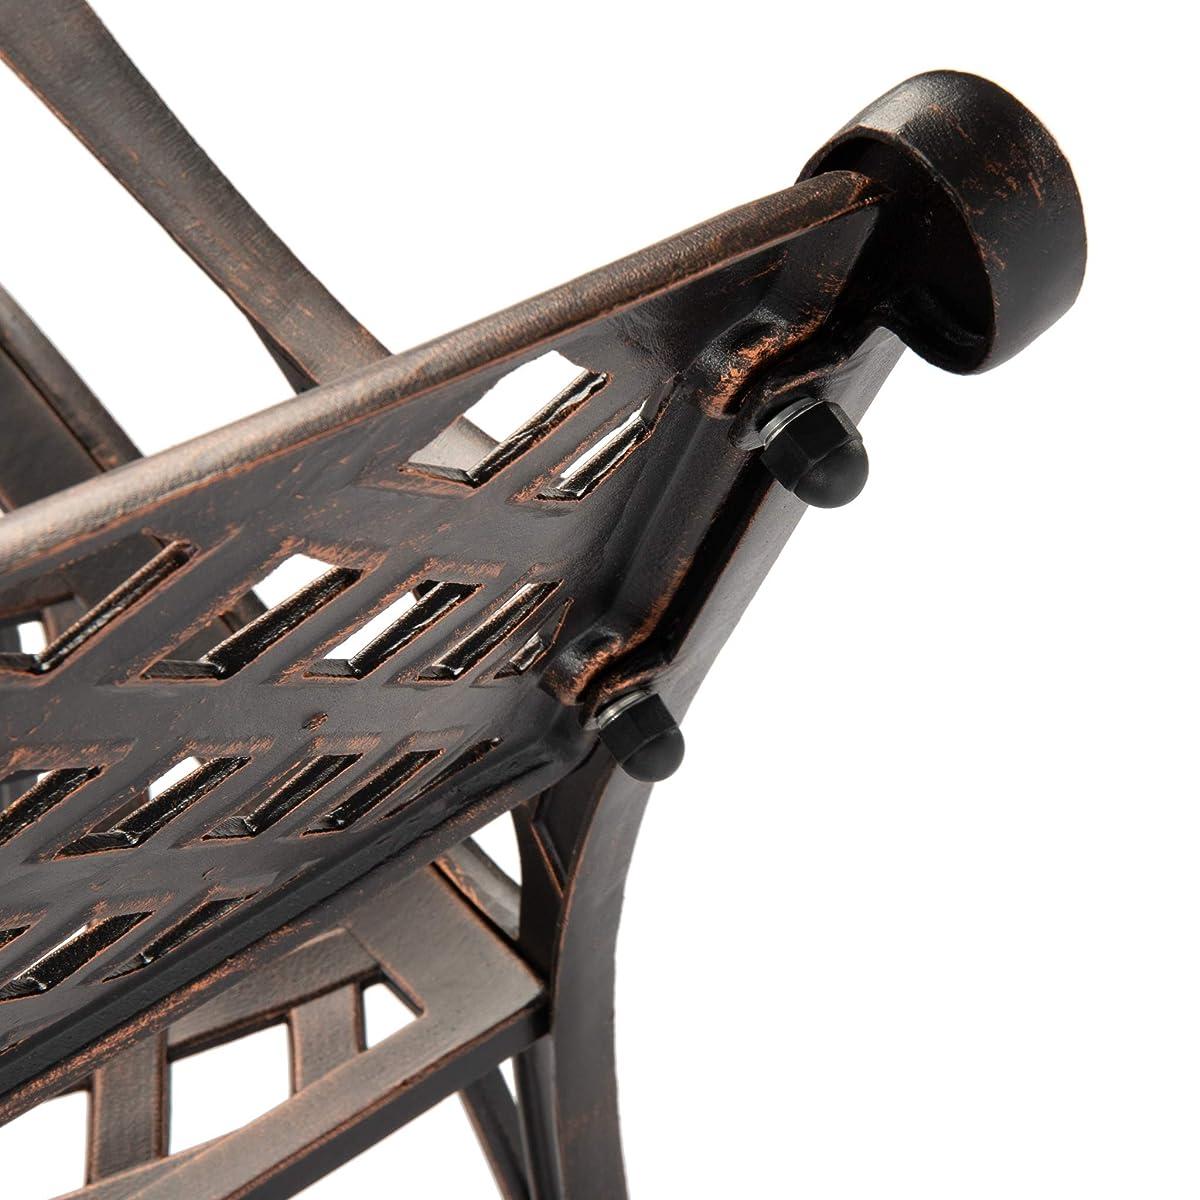 Patio Sense Antique Bronze Cast Aluminum Patio Bench